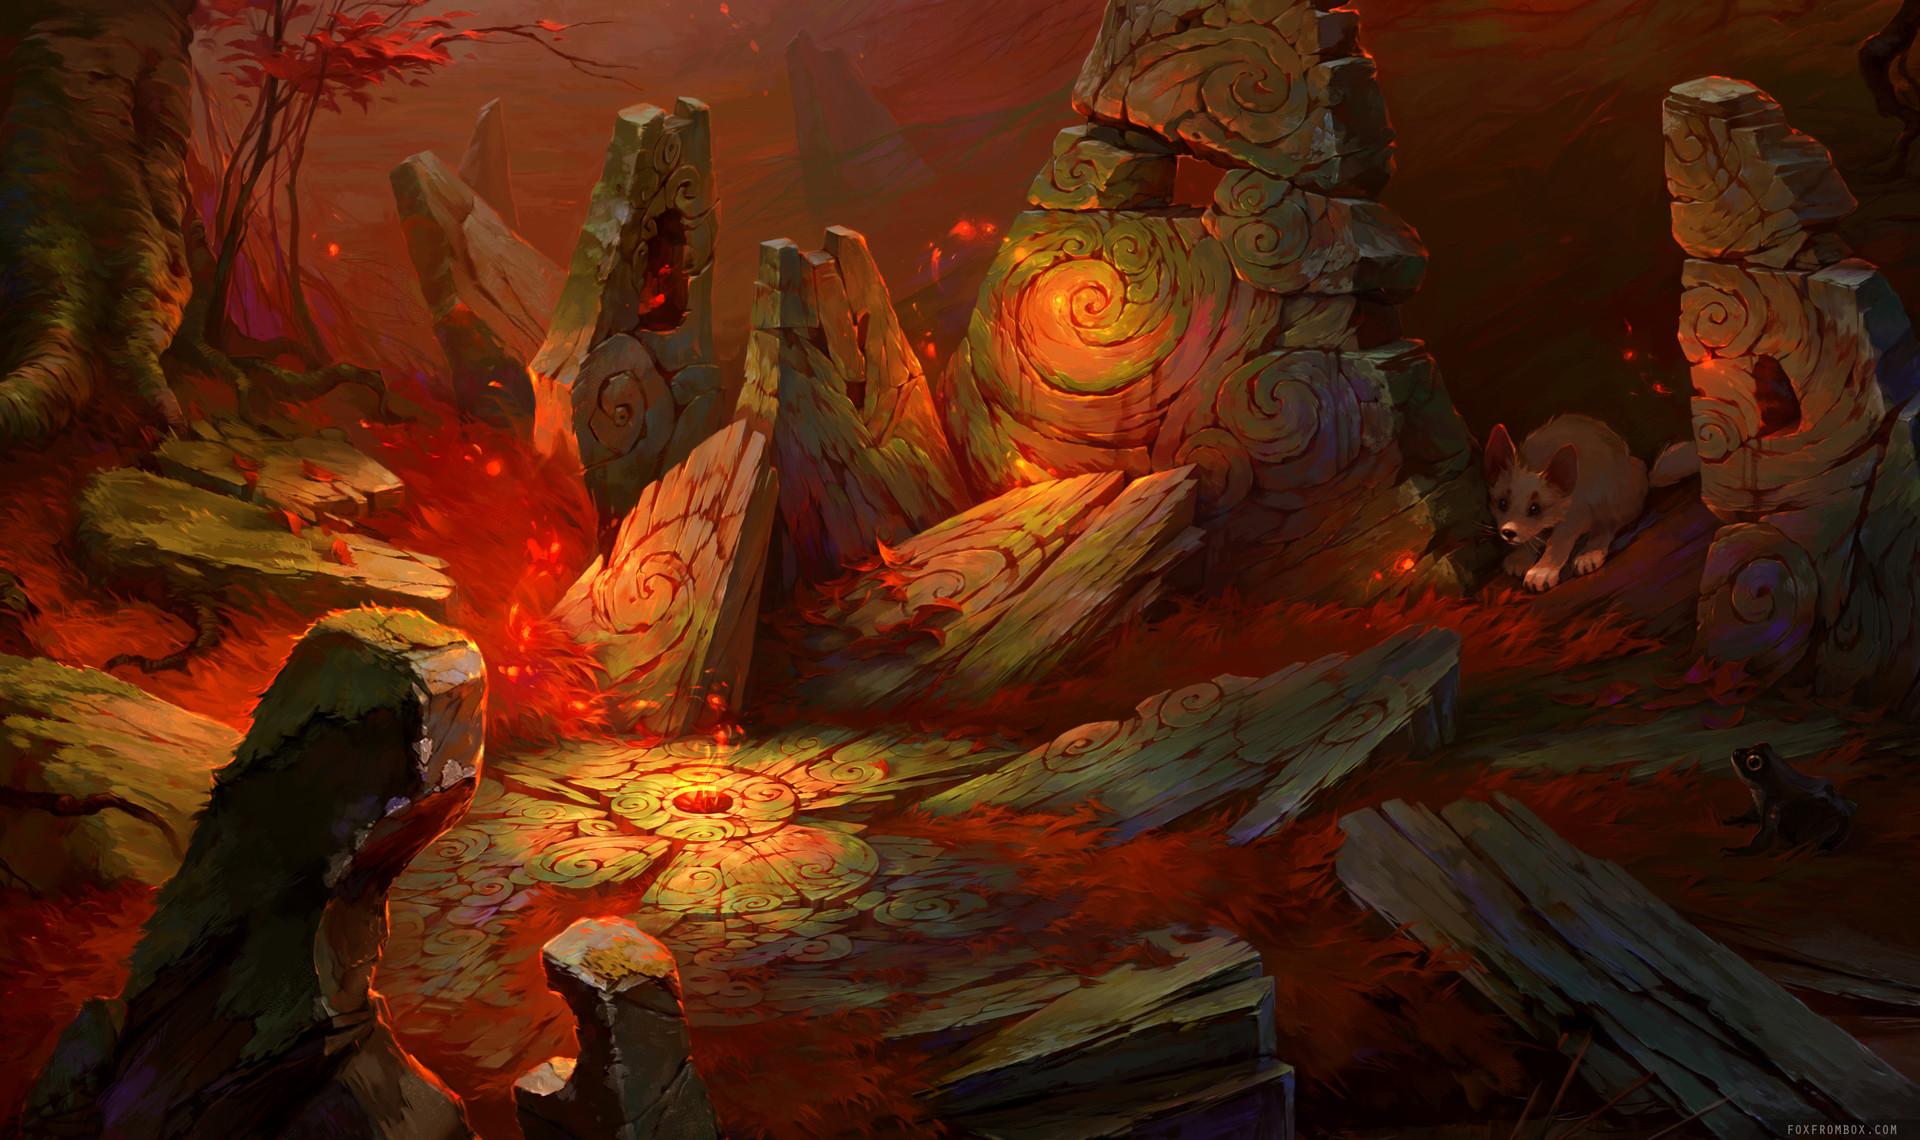 Alina ivanchenko red magic forest 100p 01